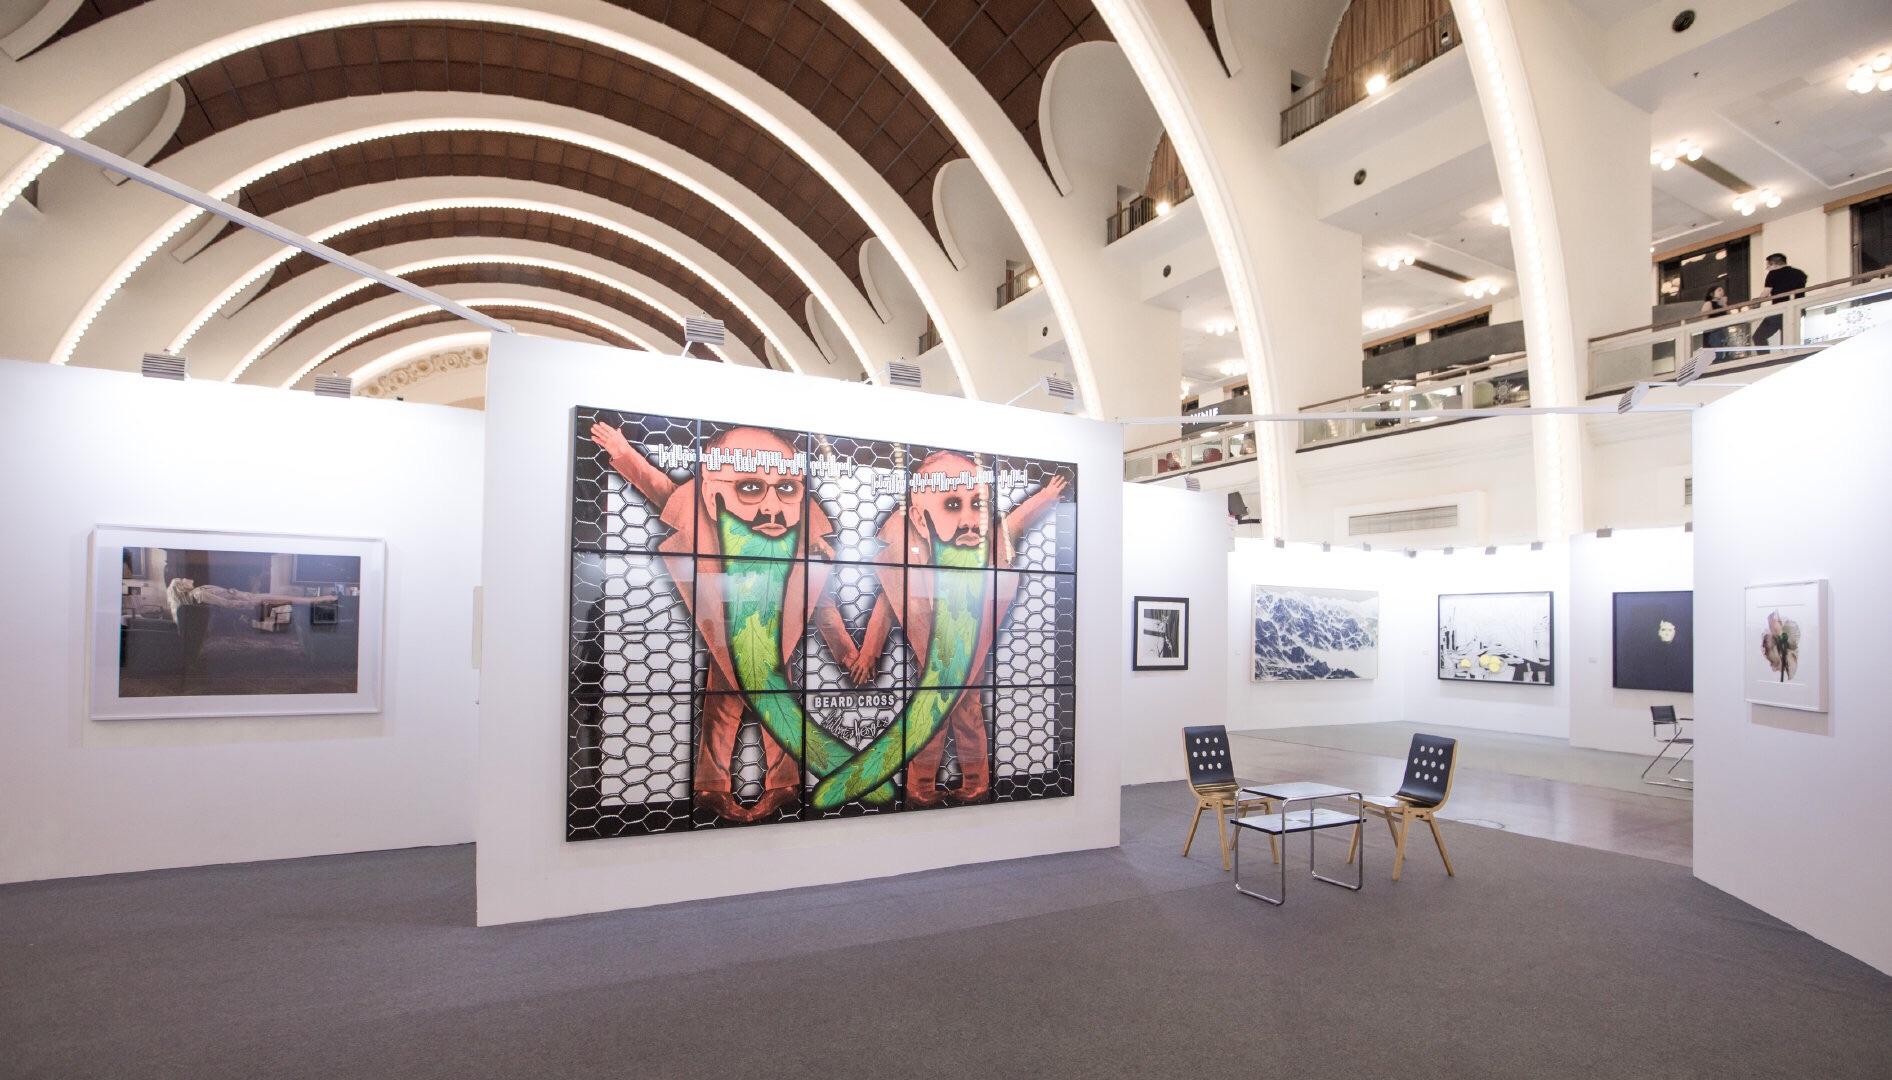 OÖ Landesgalerie Linz